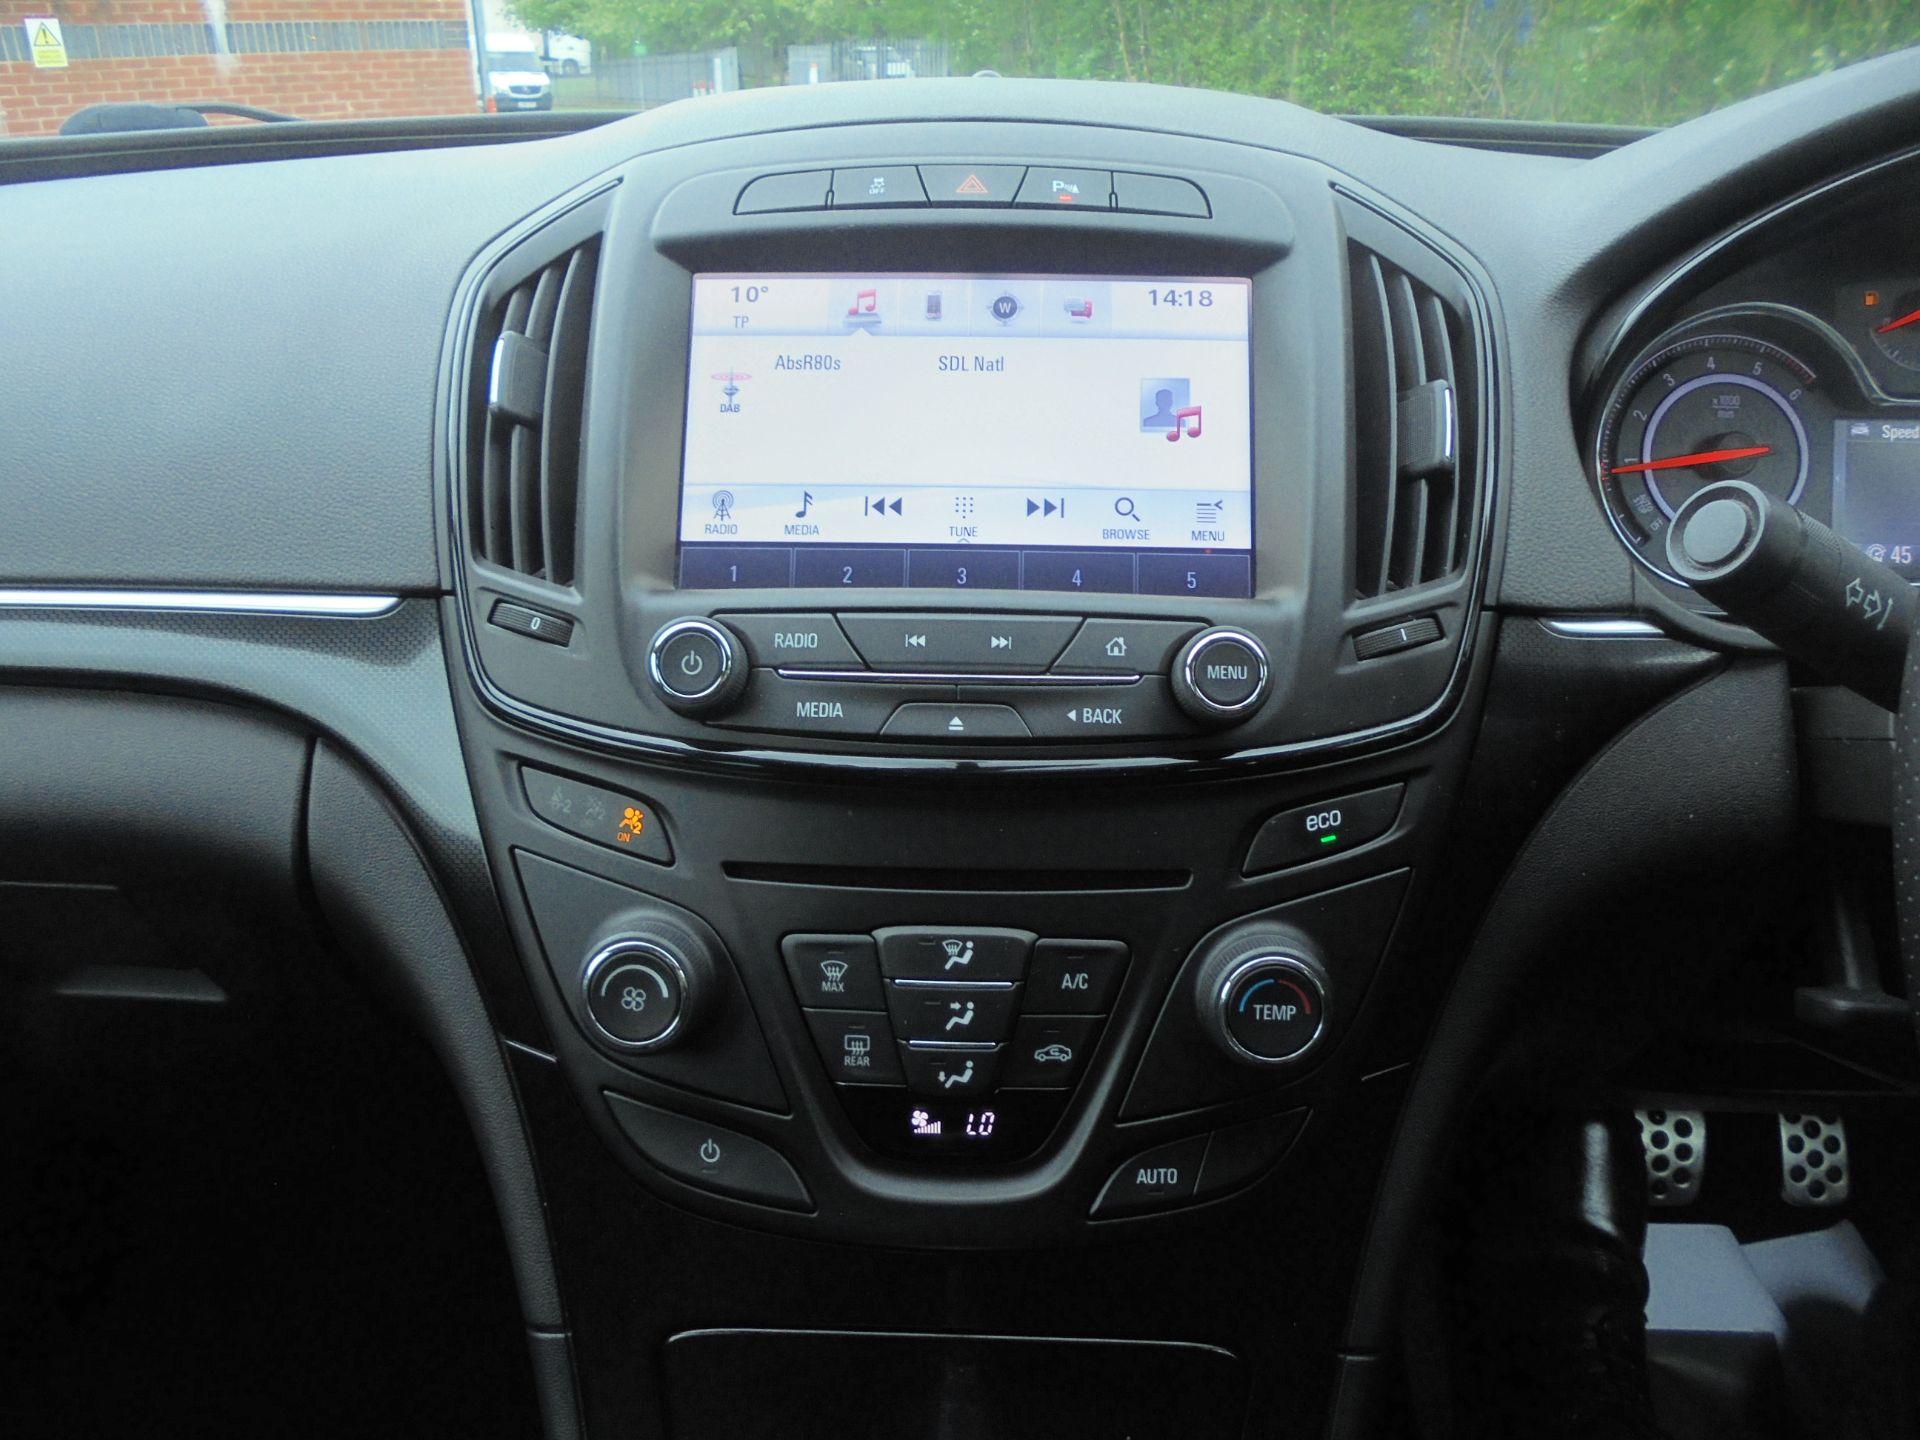 2016 Vauxhall Insignia 1.6 Cdti Sri Nav 5Dr [Start Stop] (YT16YJX) Image 14